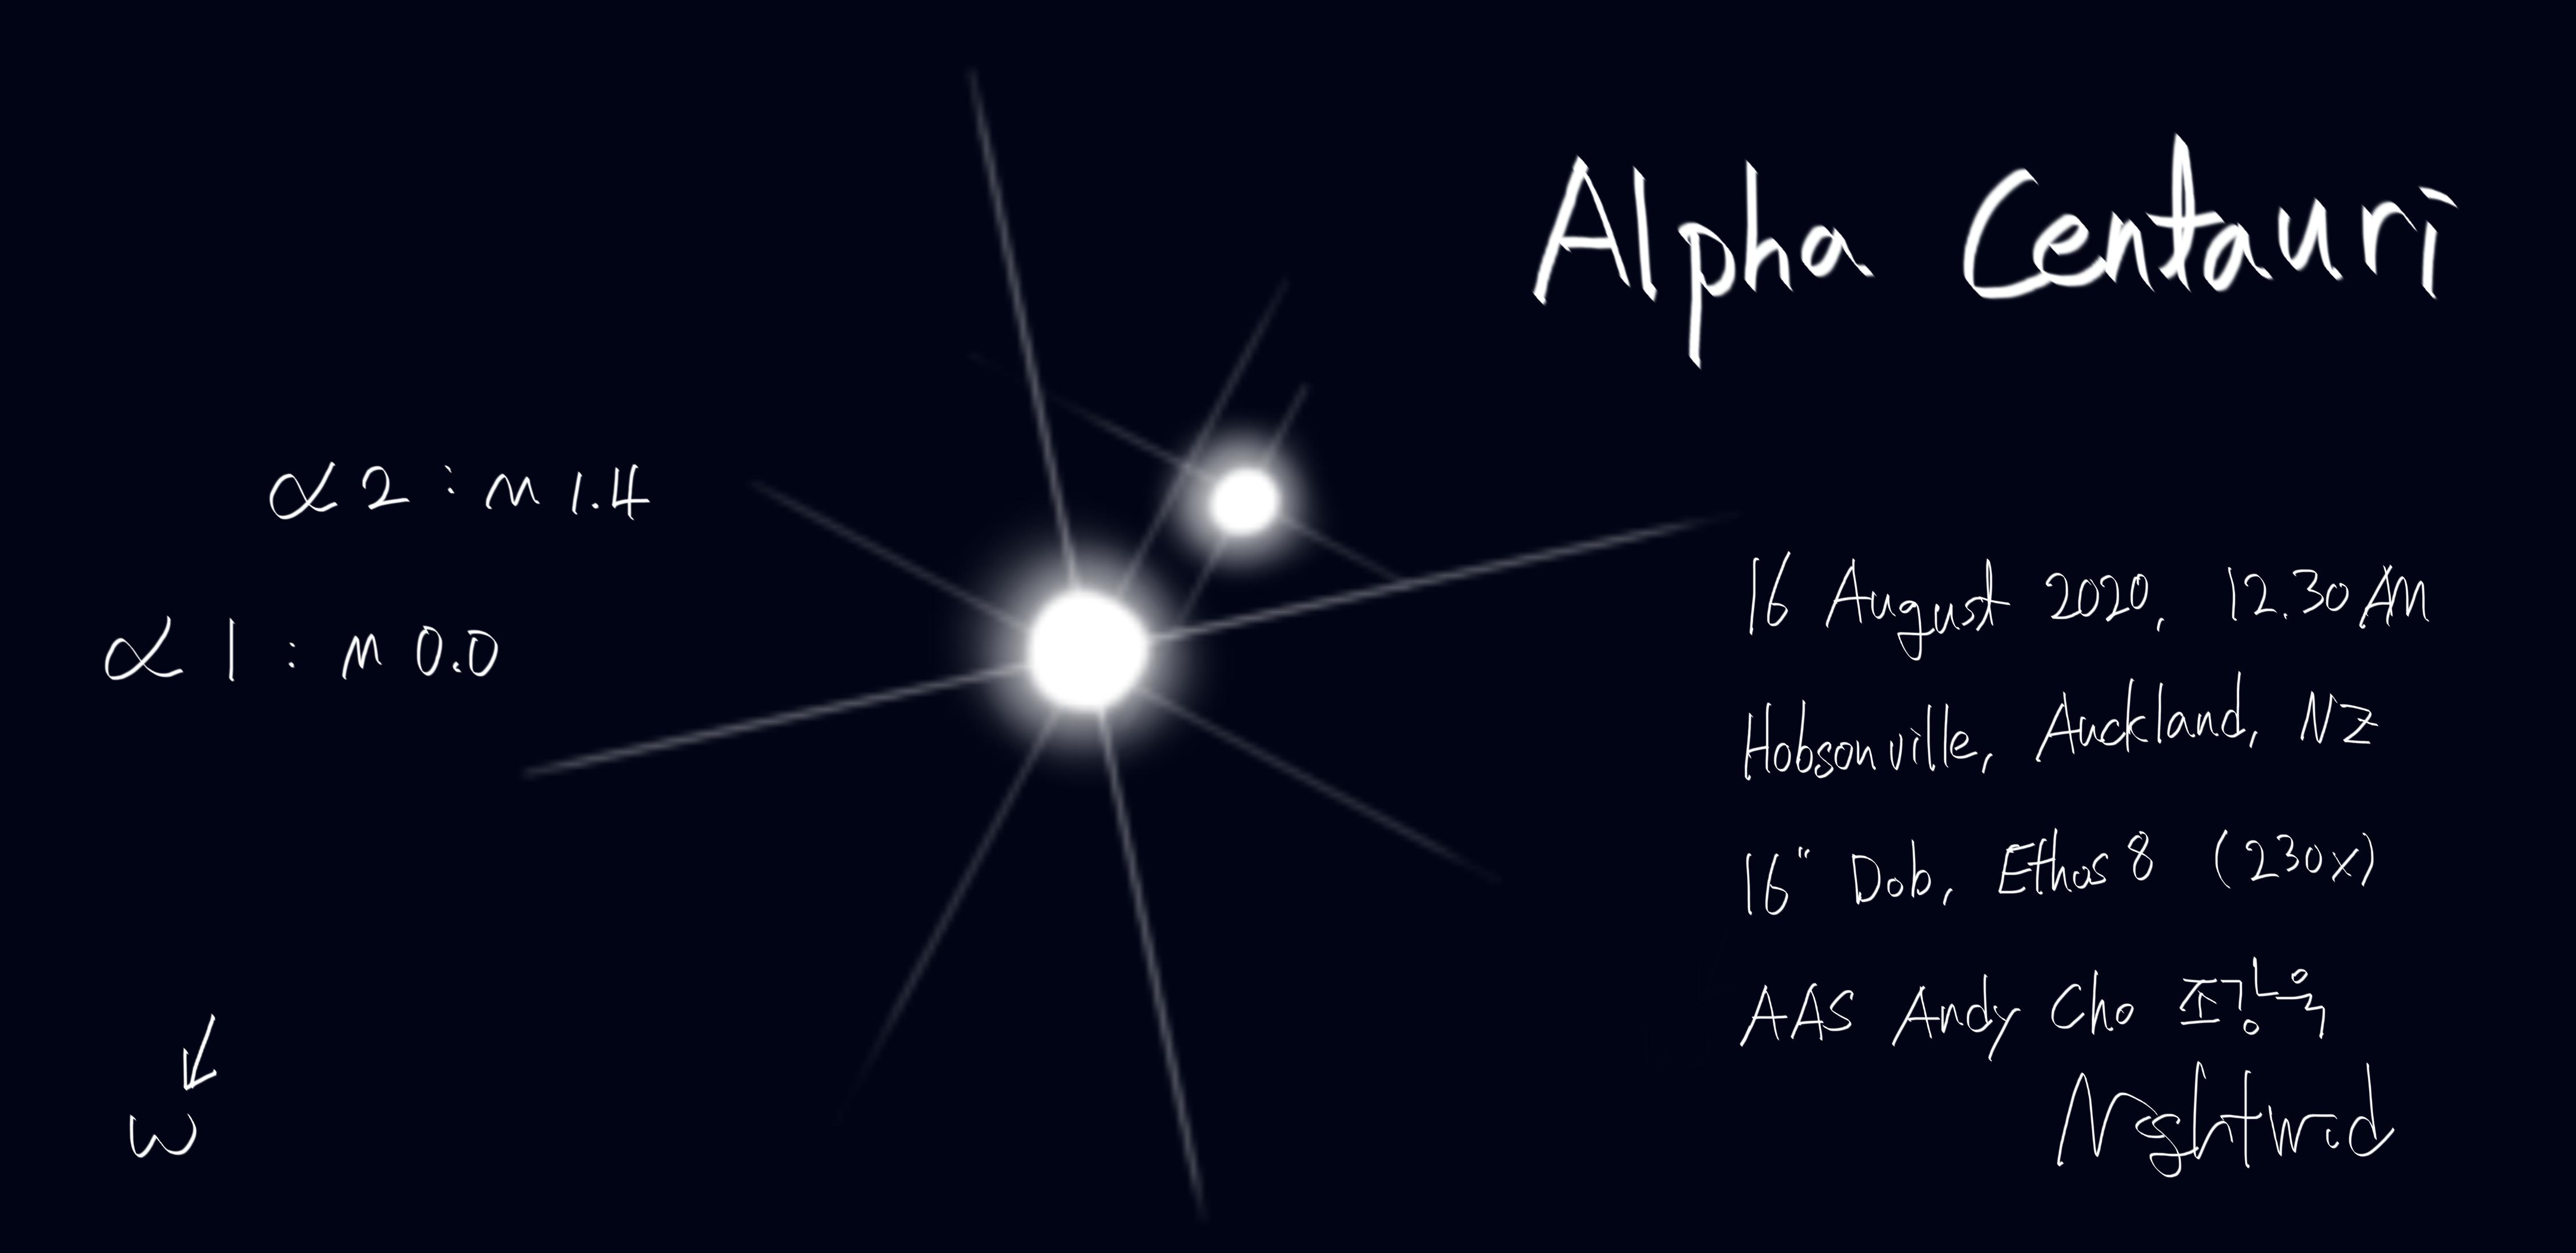 Alpha Centauri 16 August 2020.png